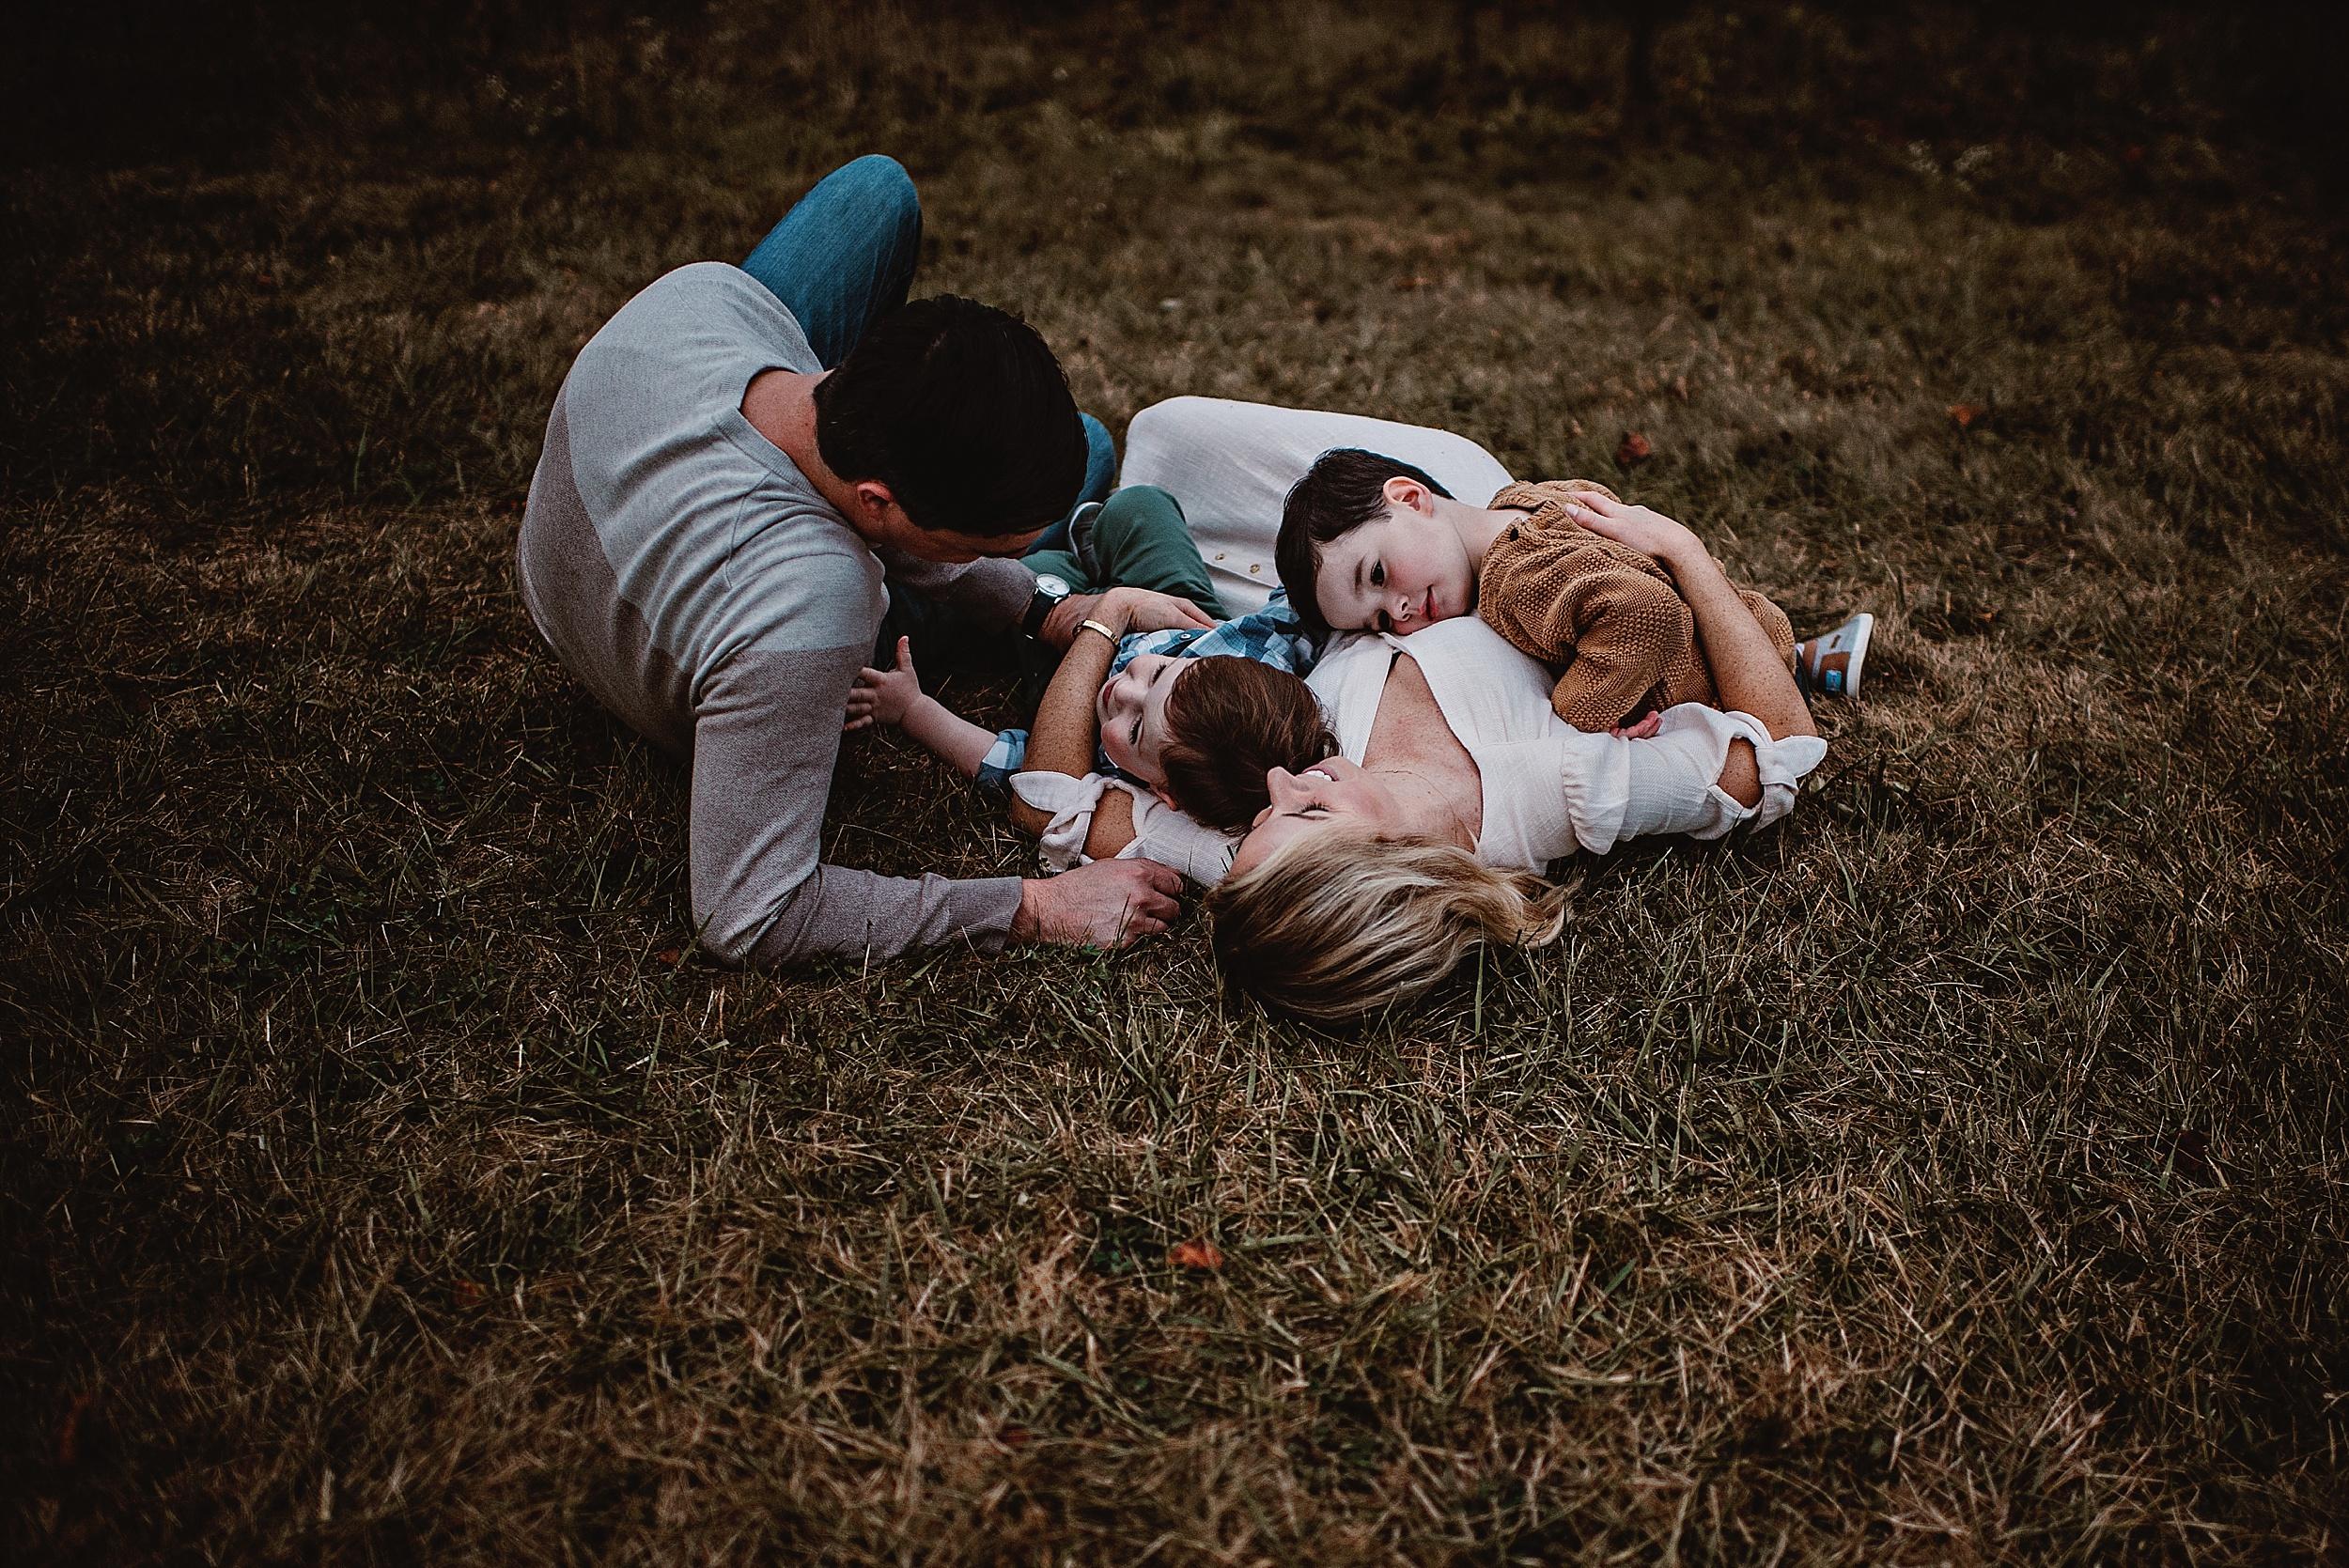 lauren-grayson-photography-portrait-artist-akron-cleveland-ohio-photographer-family-session-fields-sunset-fall_0214.jpg